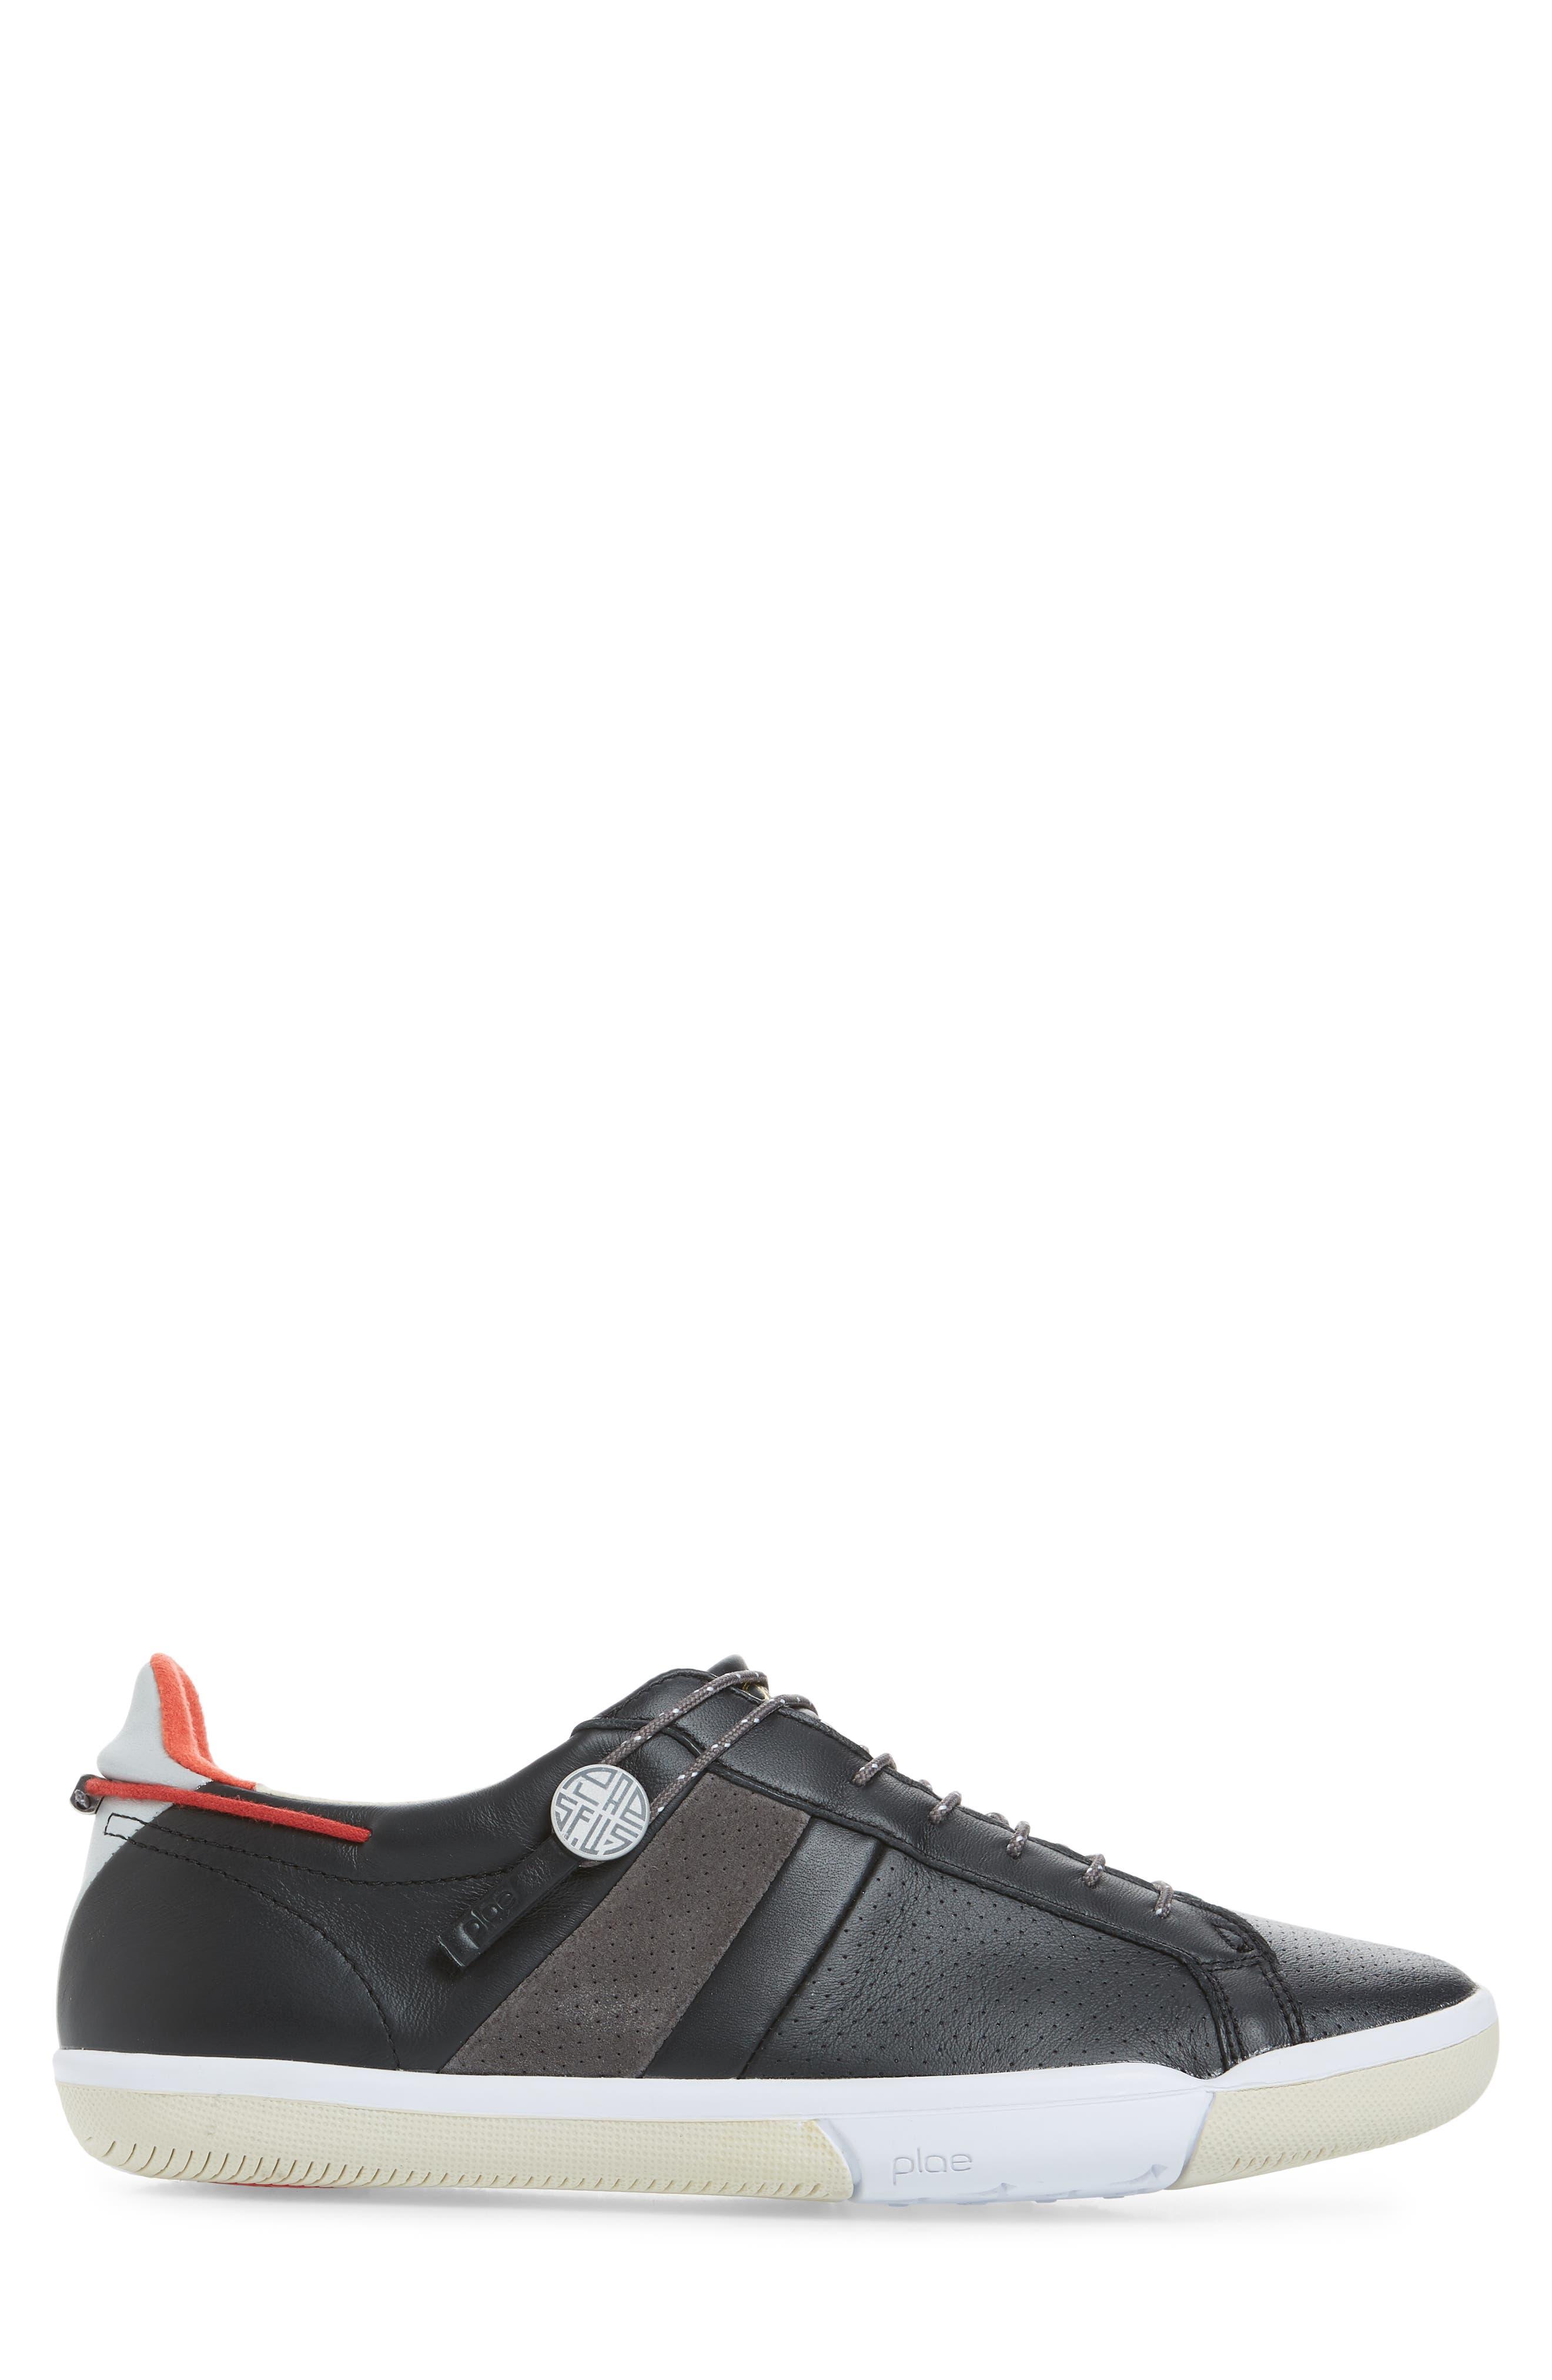 Mulberry Low Top Sneaker,                             Alternate thumbnail 3, color,                             Black